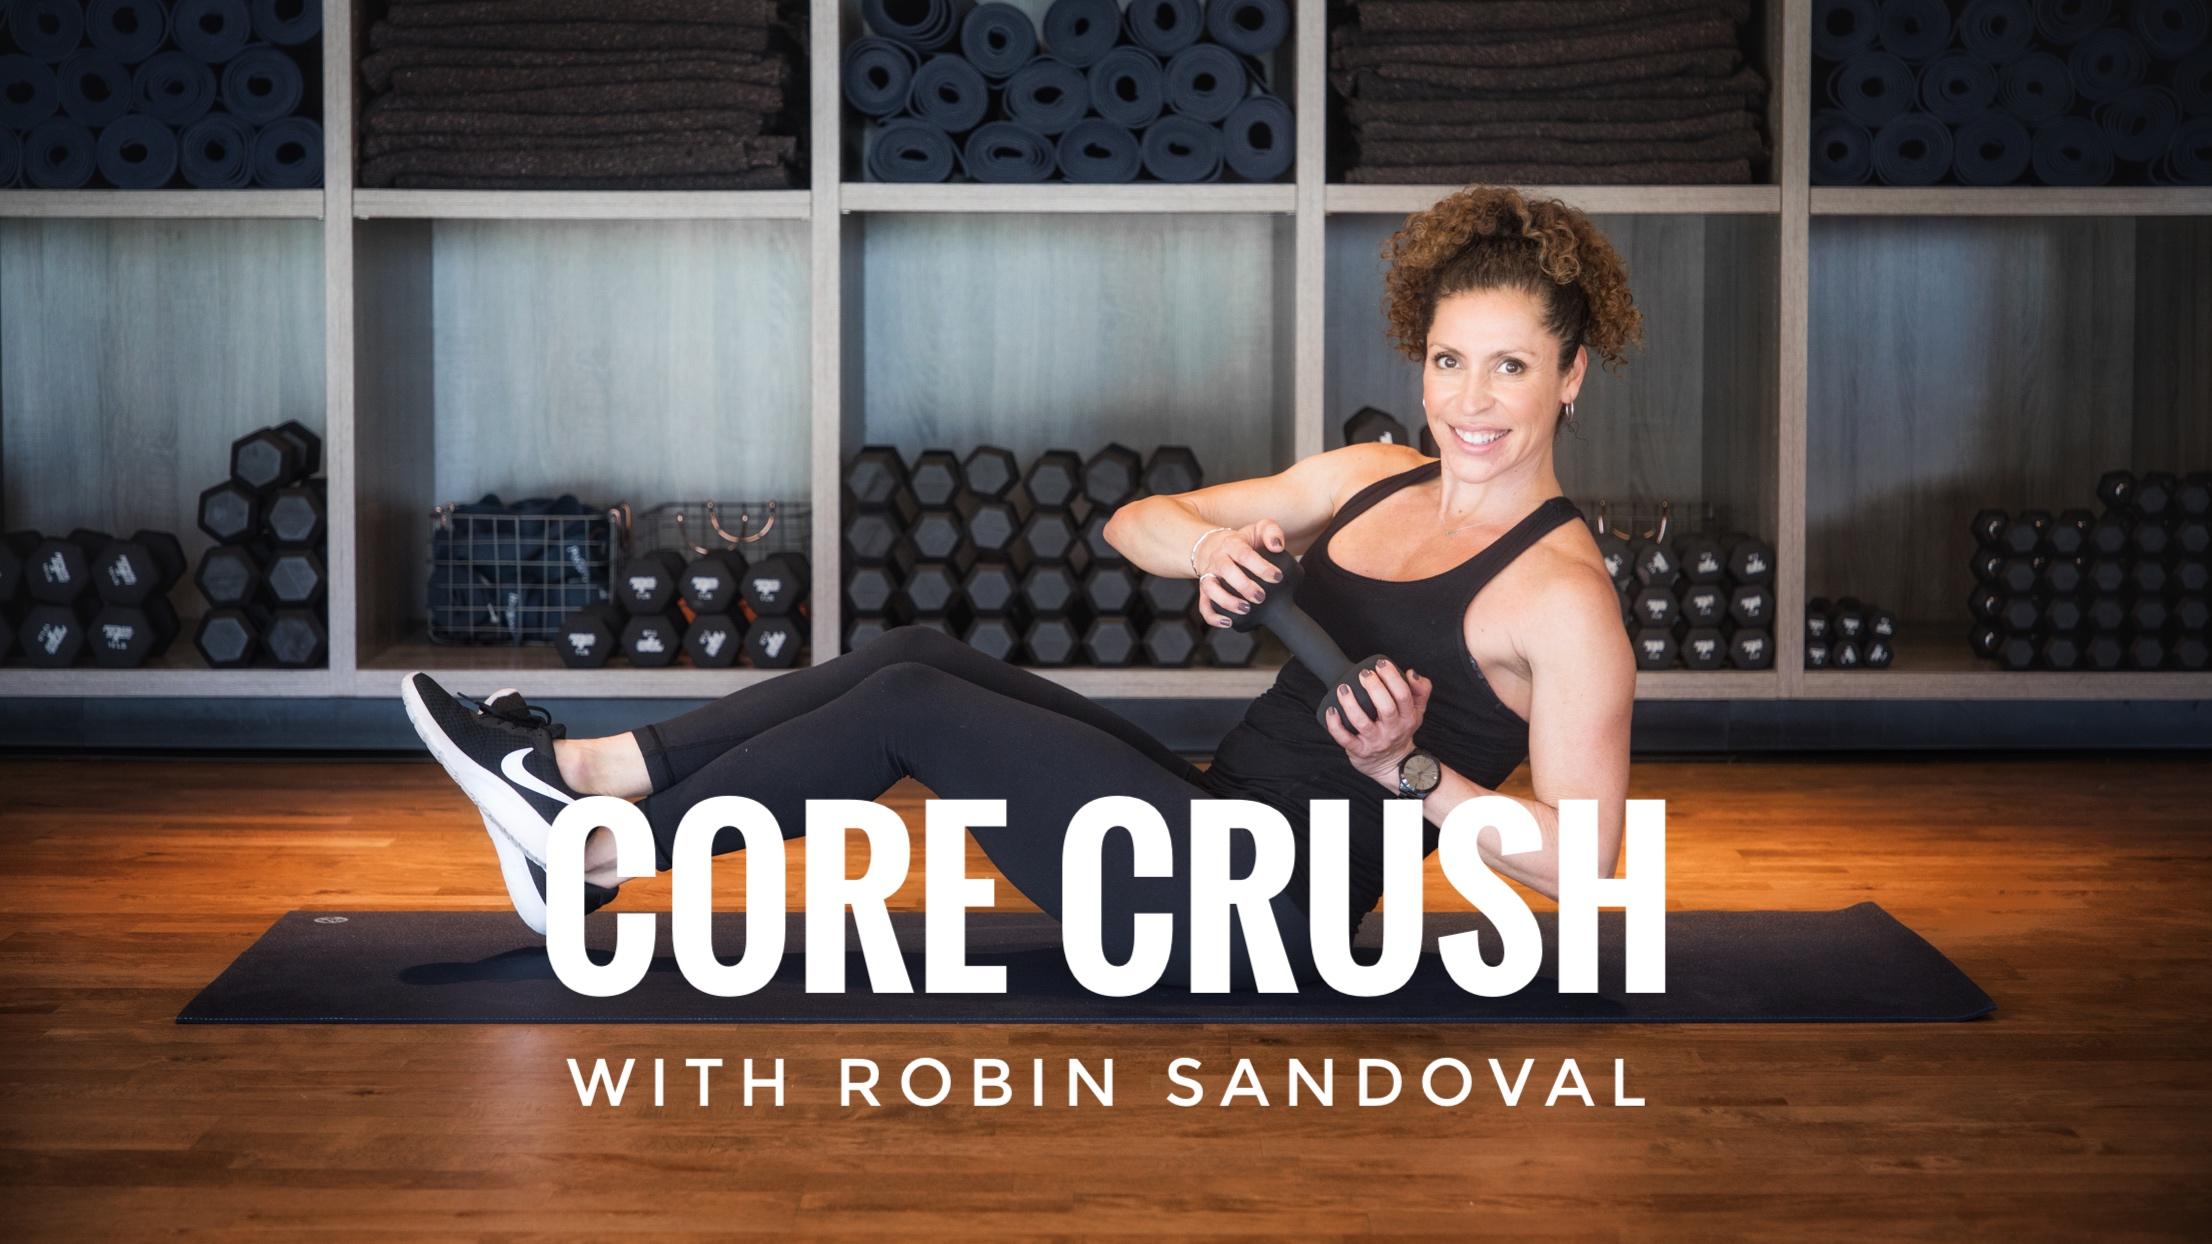 Core Crush with Robin Sandoval